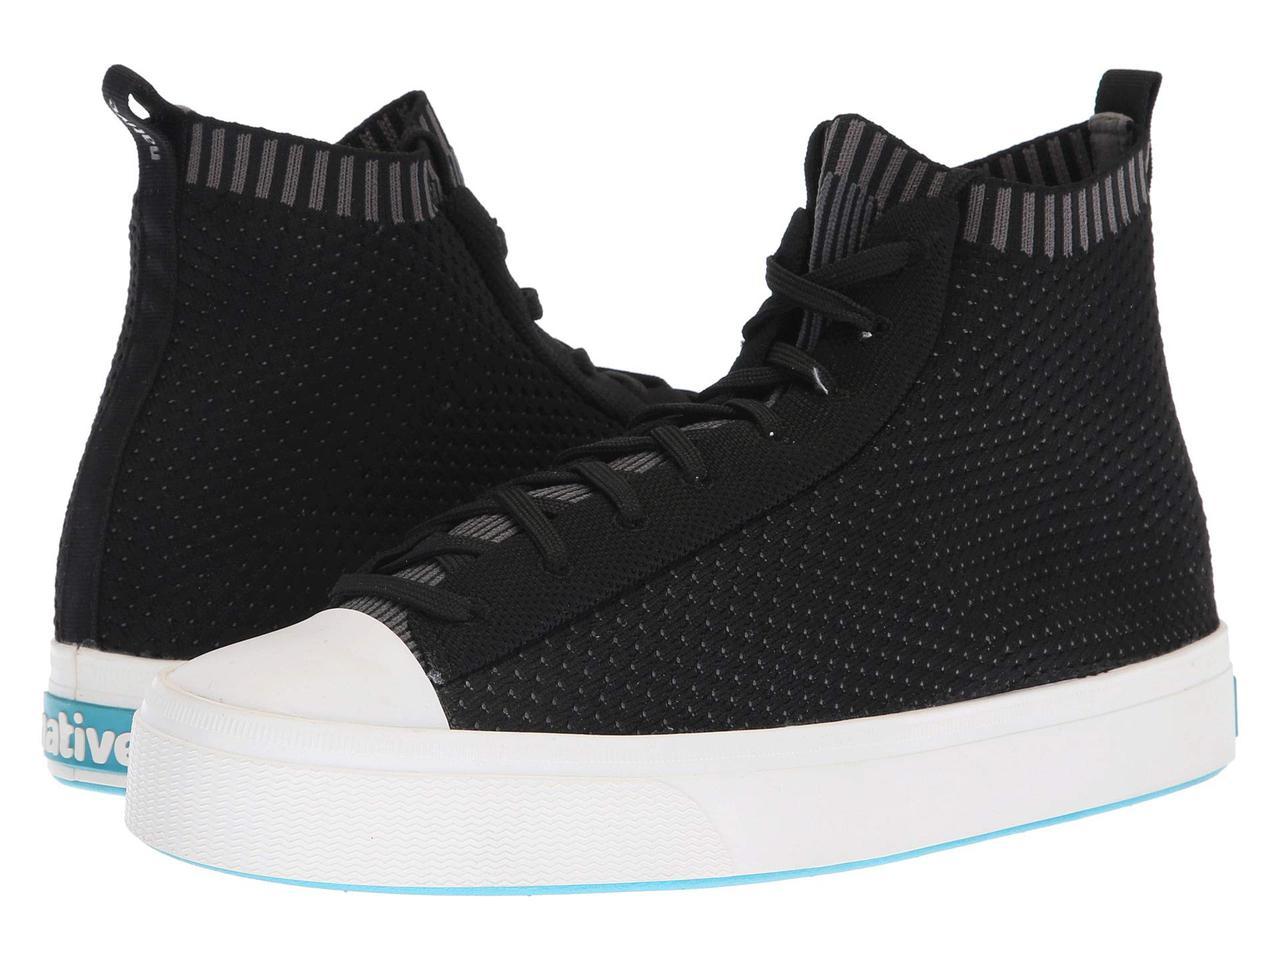 Кроссовки/Кеды (Оригинал) Native Shoes Jefferson 2.0 High Jiffy Black/Shell White